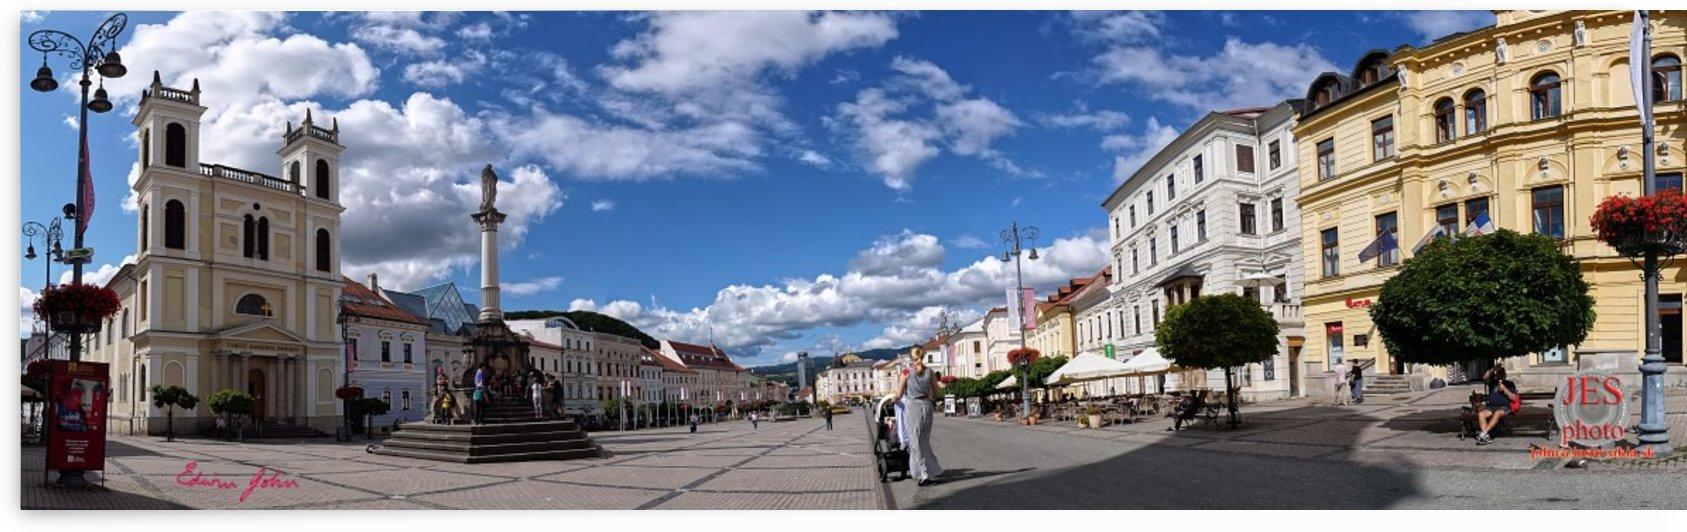 Banska Bystrica visual panorama Main Square by Edwin John